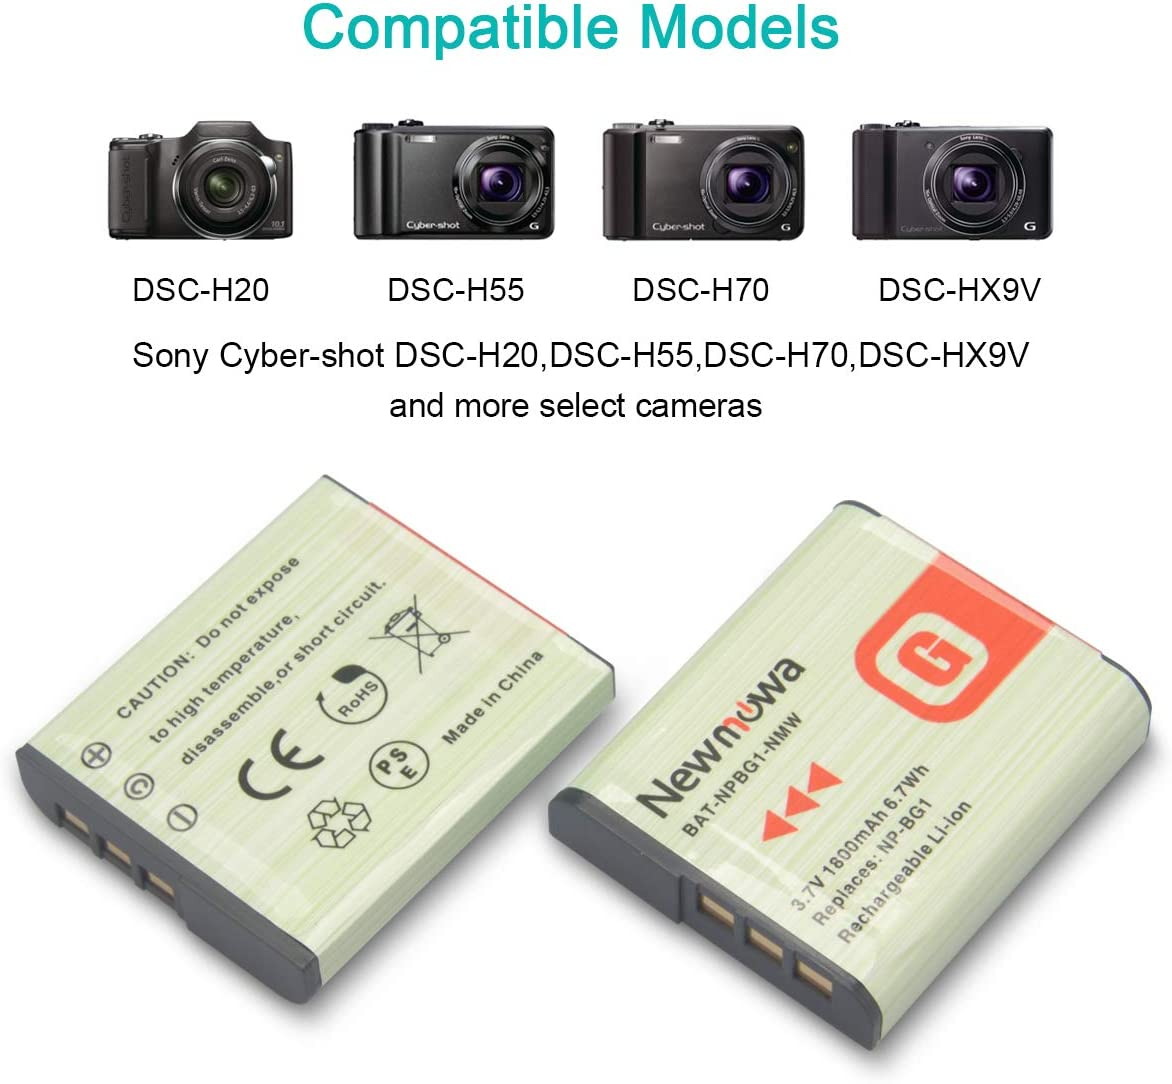 Sony DSC-H9 1200mah, 3.7v, Li-ion for Sony Digital Camera Compatible with Sony DSC-HX9V Sony Cyber-Shot DSC-H70 Sony NP-BG1 Sony DSC-H20 NP-BG1 Battery Replacement Sony DSC-HX20V